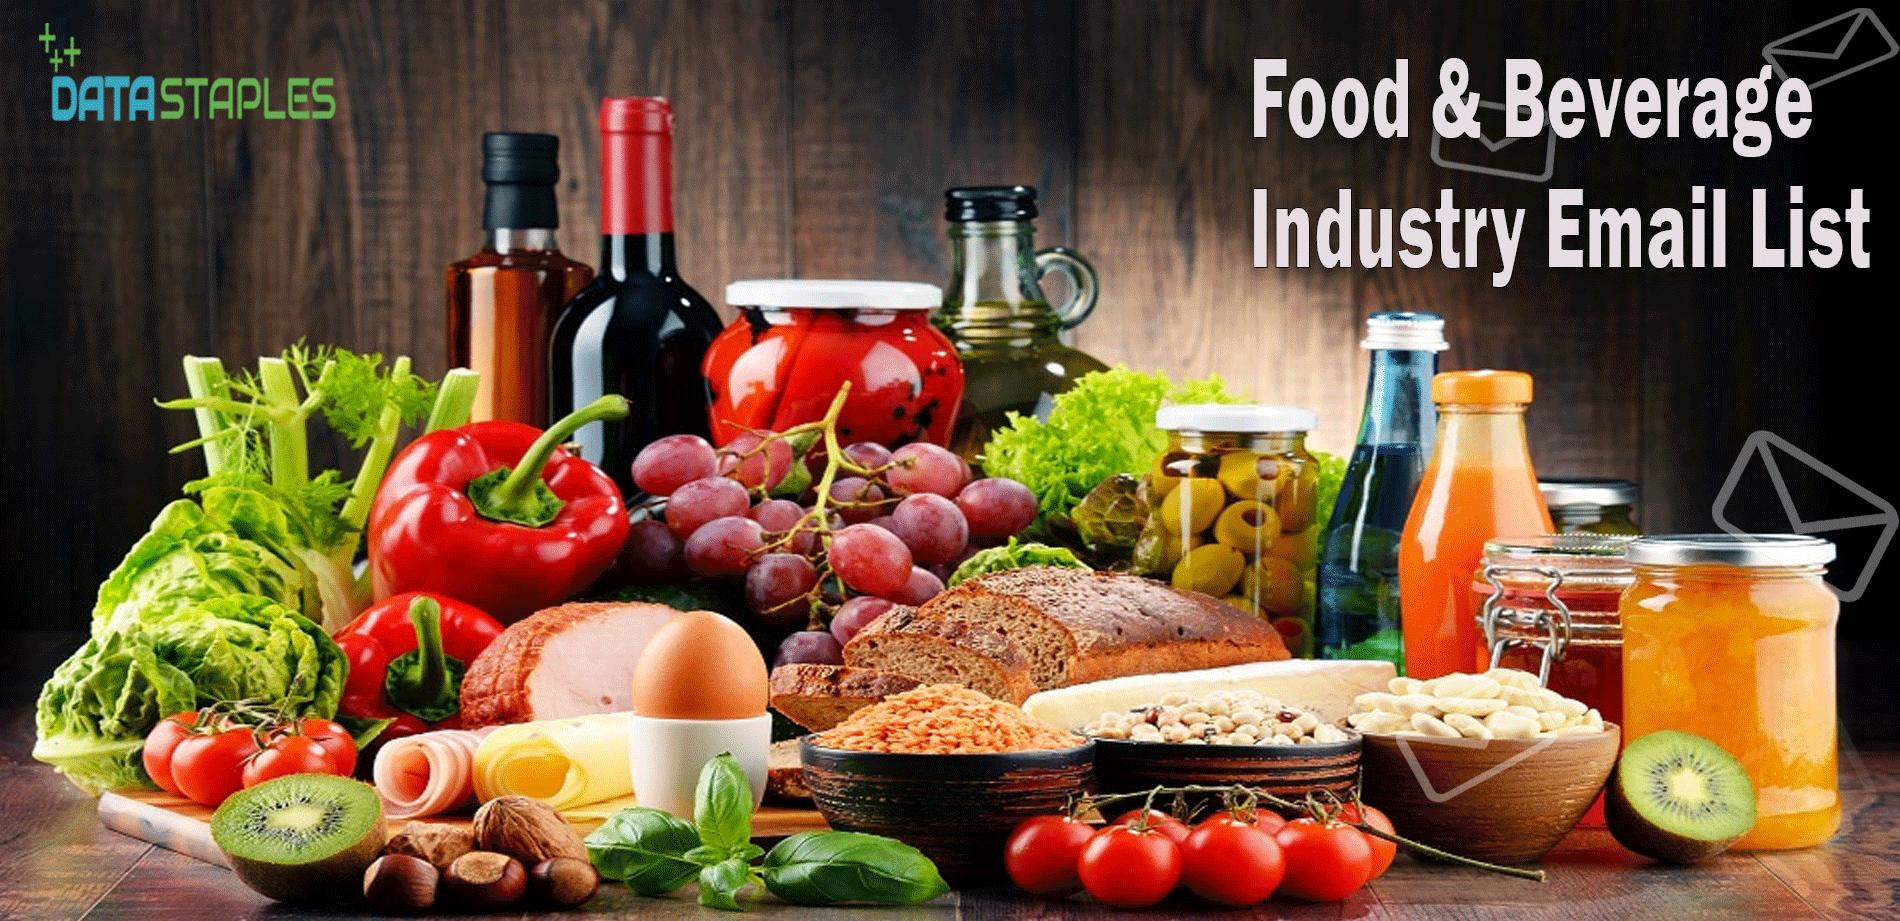 Food Beverage Industry Email List | DataStaples